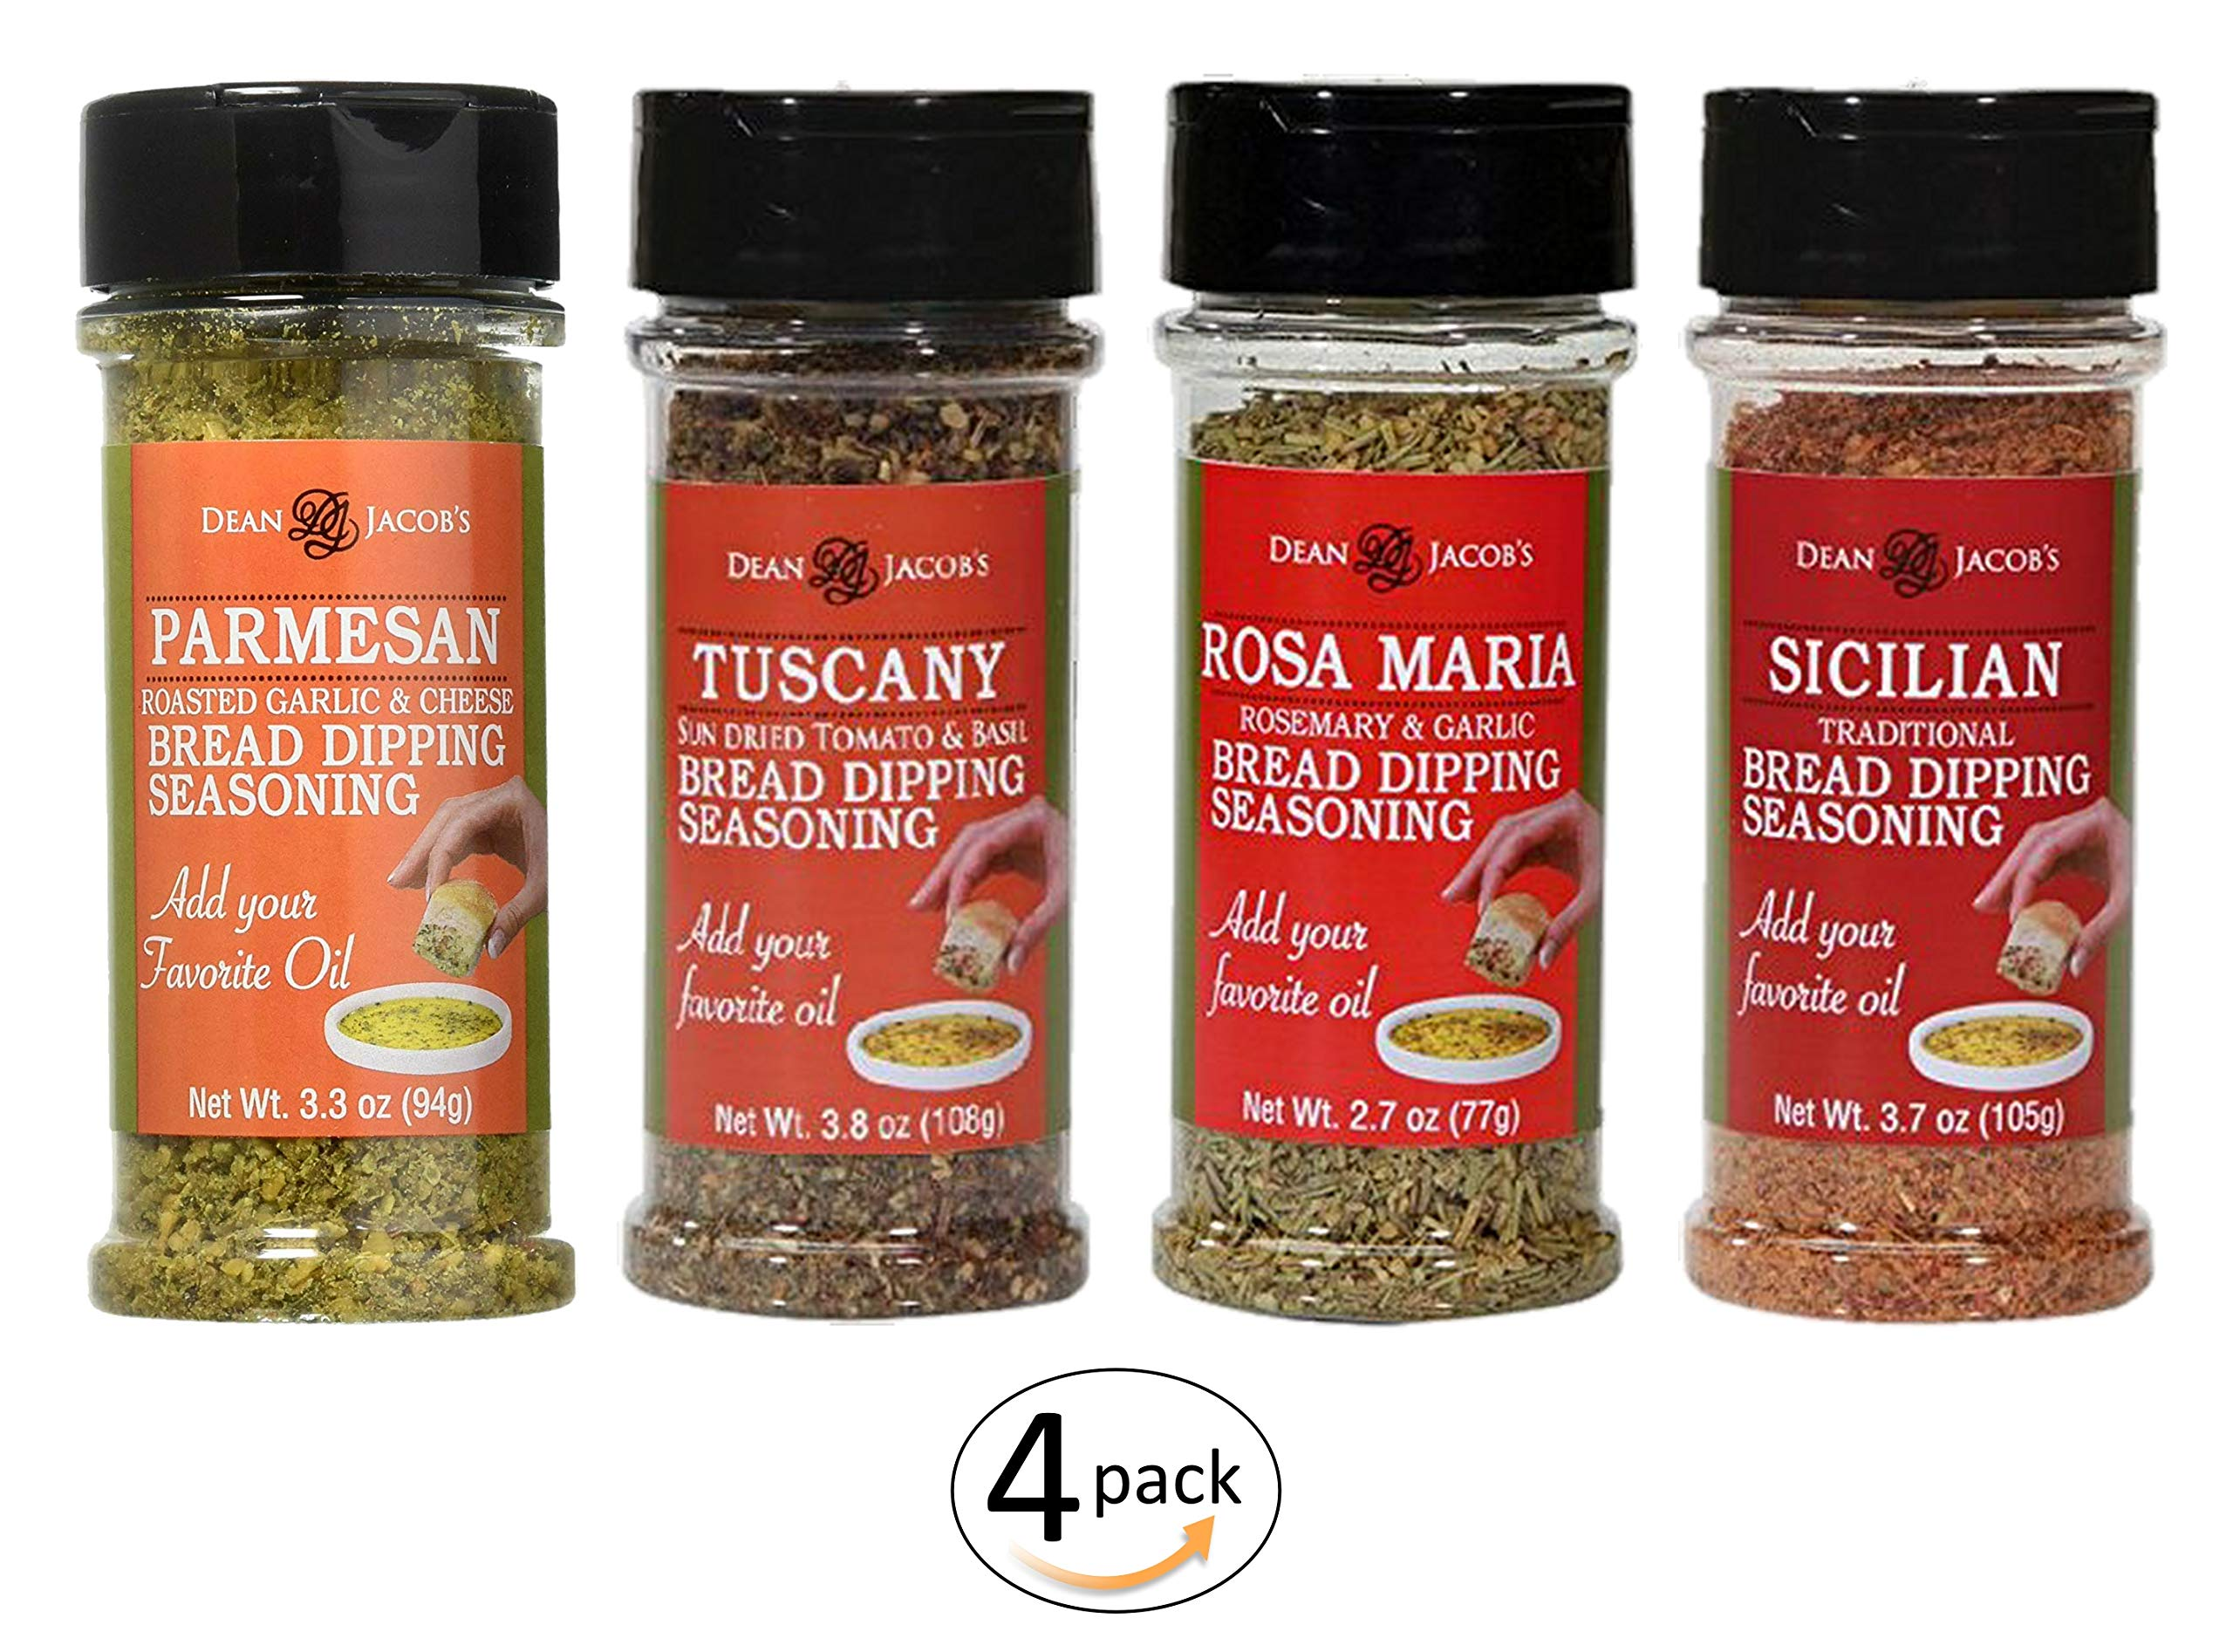 4 Italian Bread Dipping Seasoning Flavors: Parmesan 3.3oz - Tuscany 3.8oz - Sicilian 3.7oz - Rosa Maria 2.7oz in 4 Stacker Jars